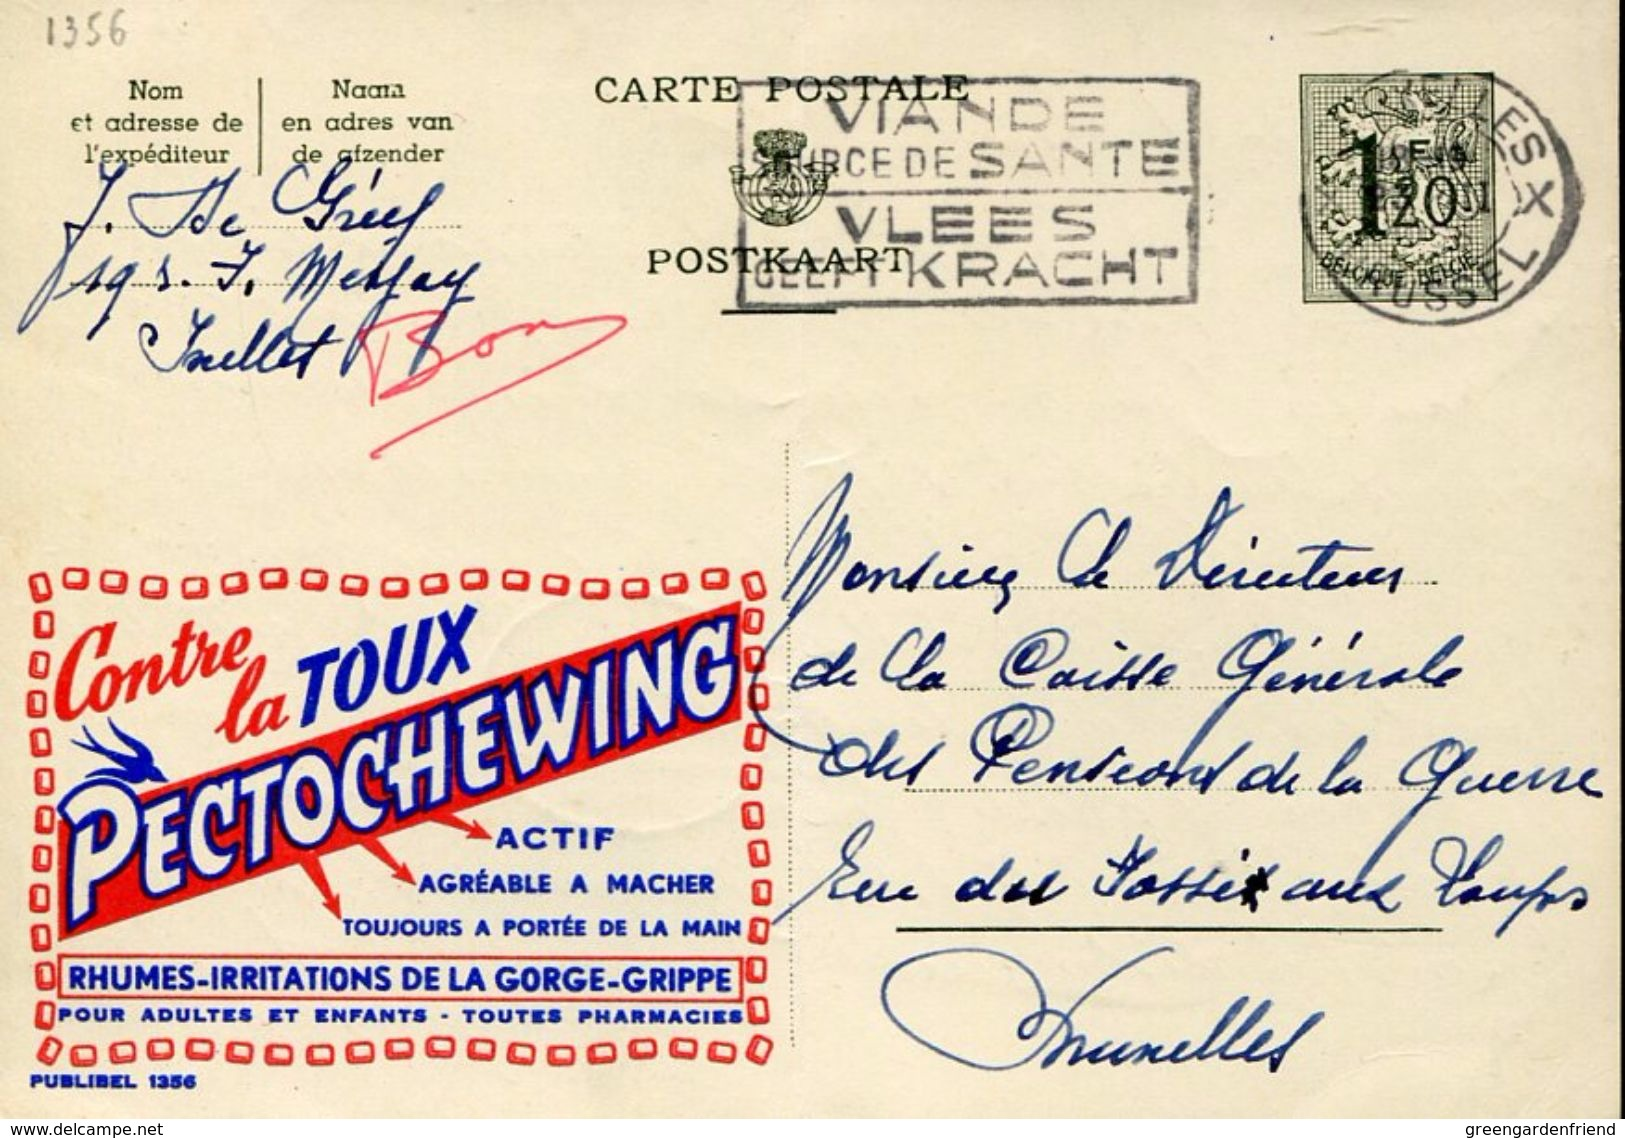 27351 Belgium, Stationery Card  Circuled 1956 Publibel 1356, Contre La Toux Pectochewing - Medicine